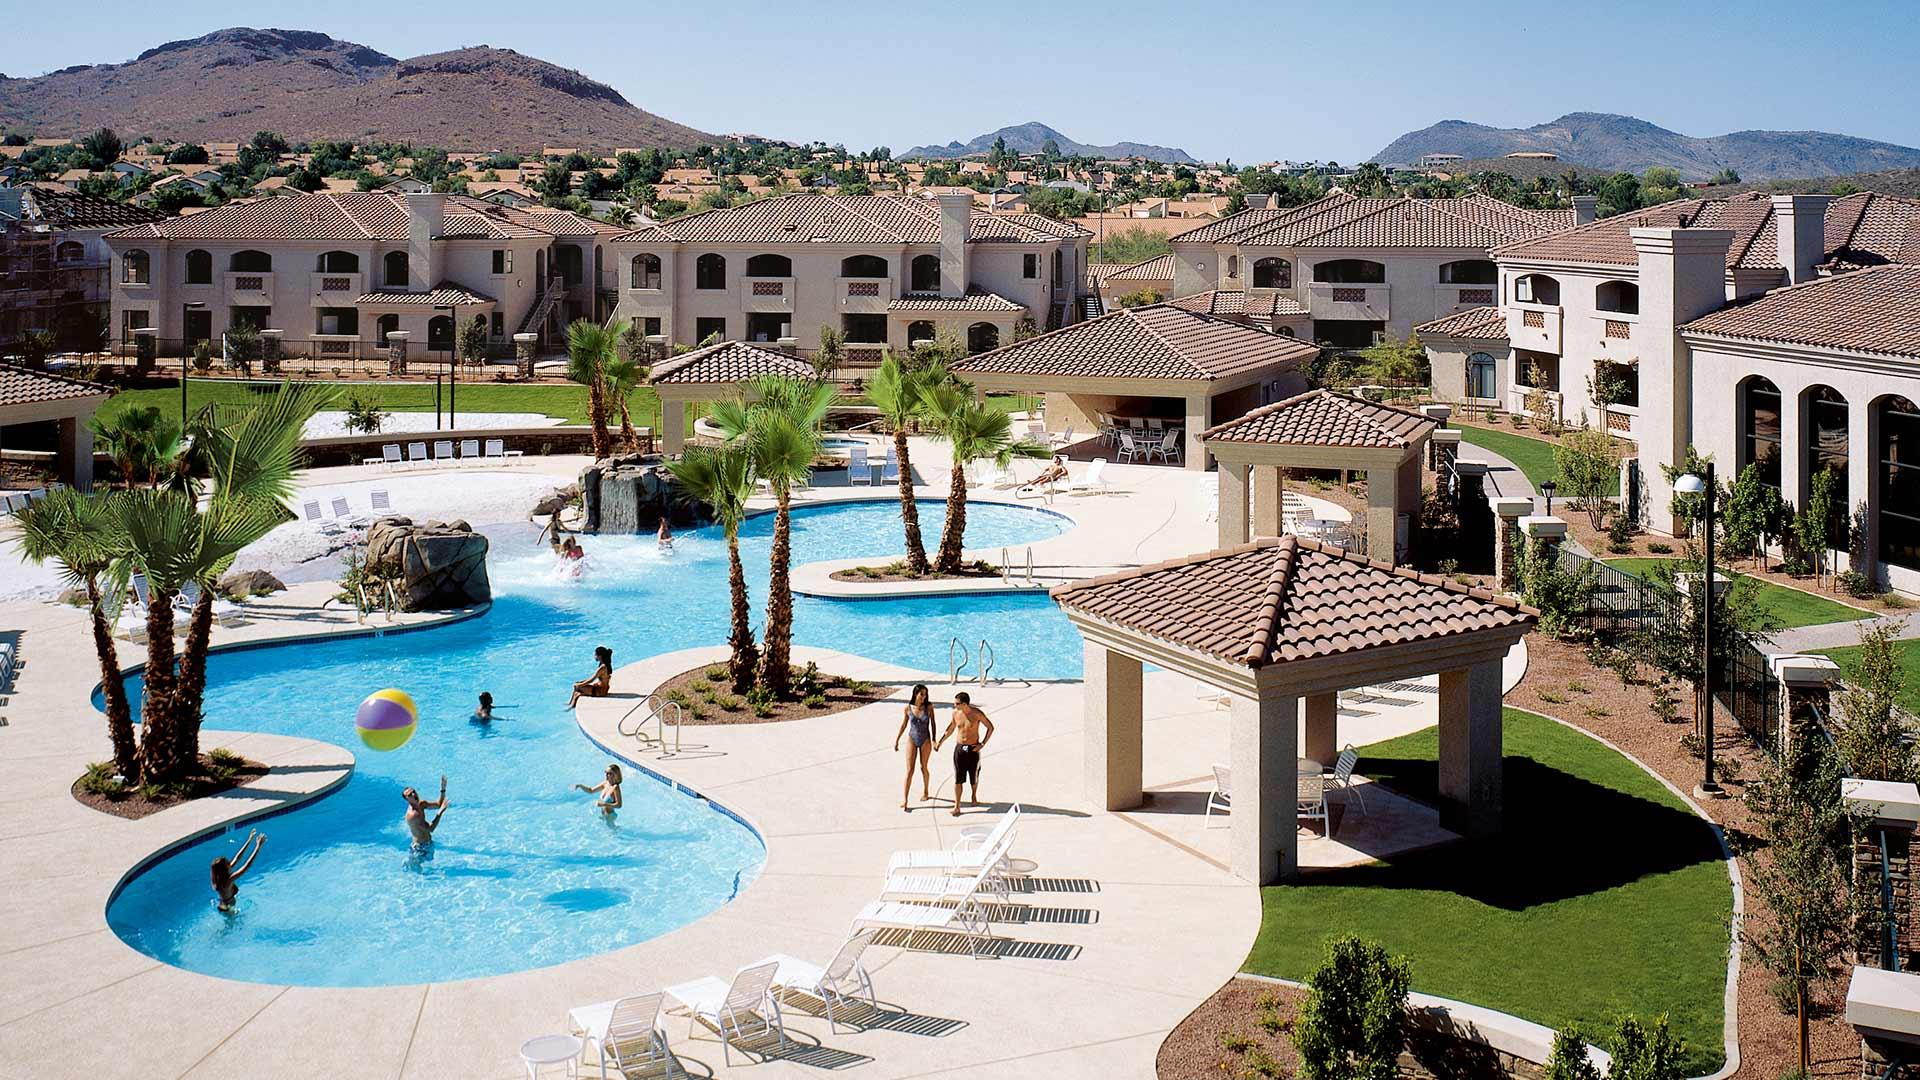 San Pedregal - Phoenix